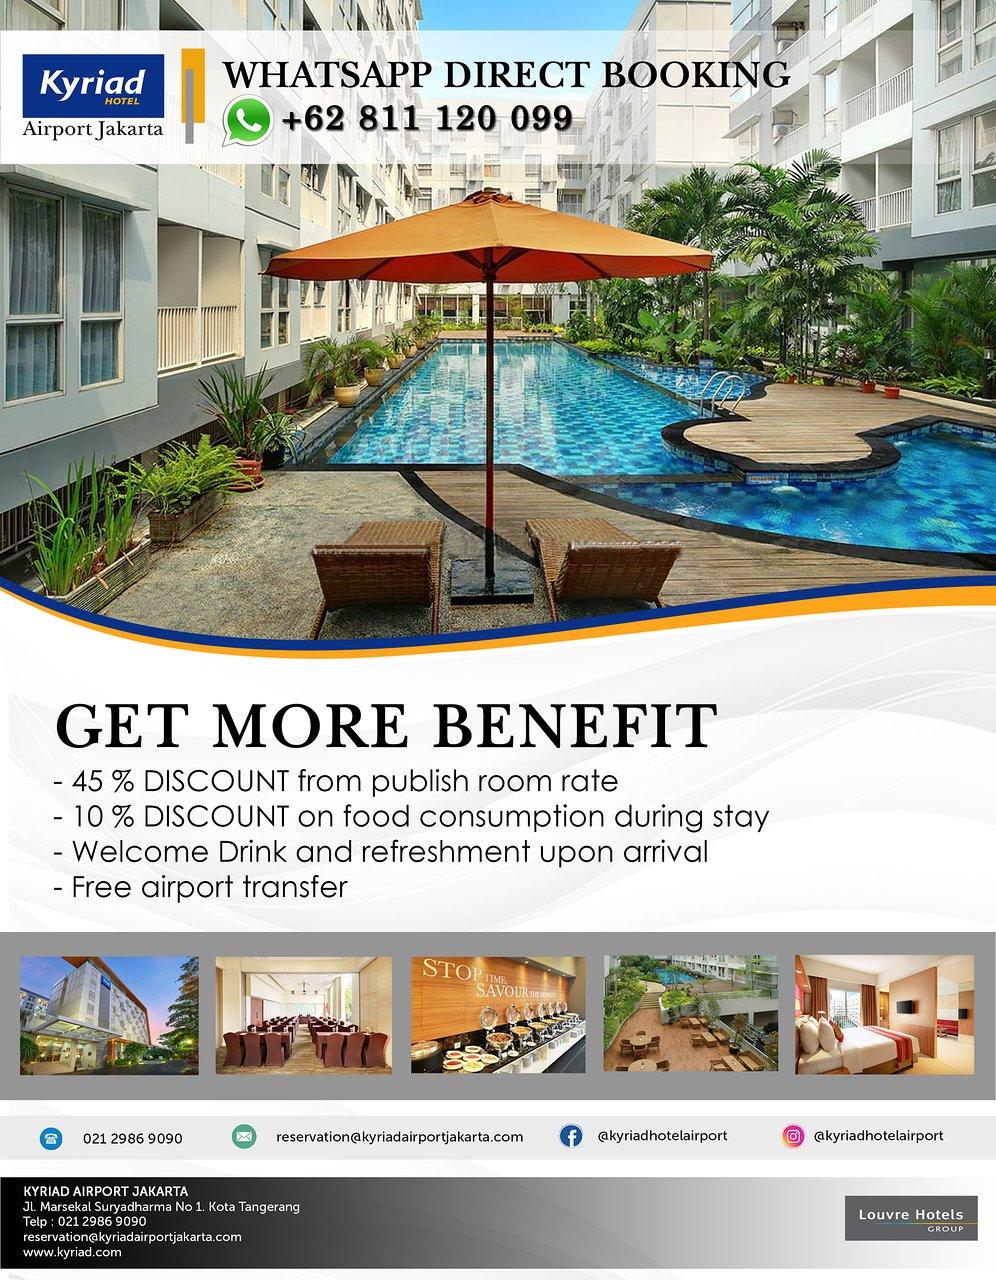 Kyriad Hotel Airport Jakarta 18 2 9 Prices Reviews Tangerang Indonesia Tripadvisor